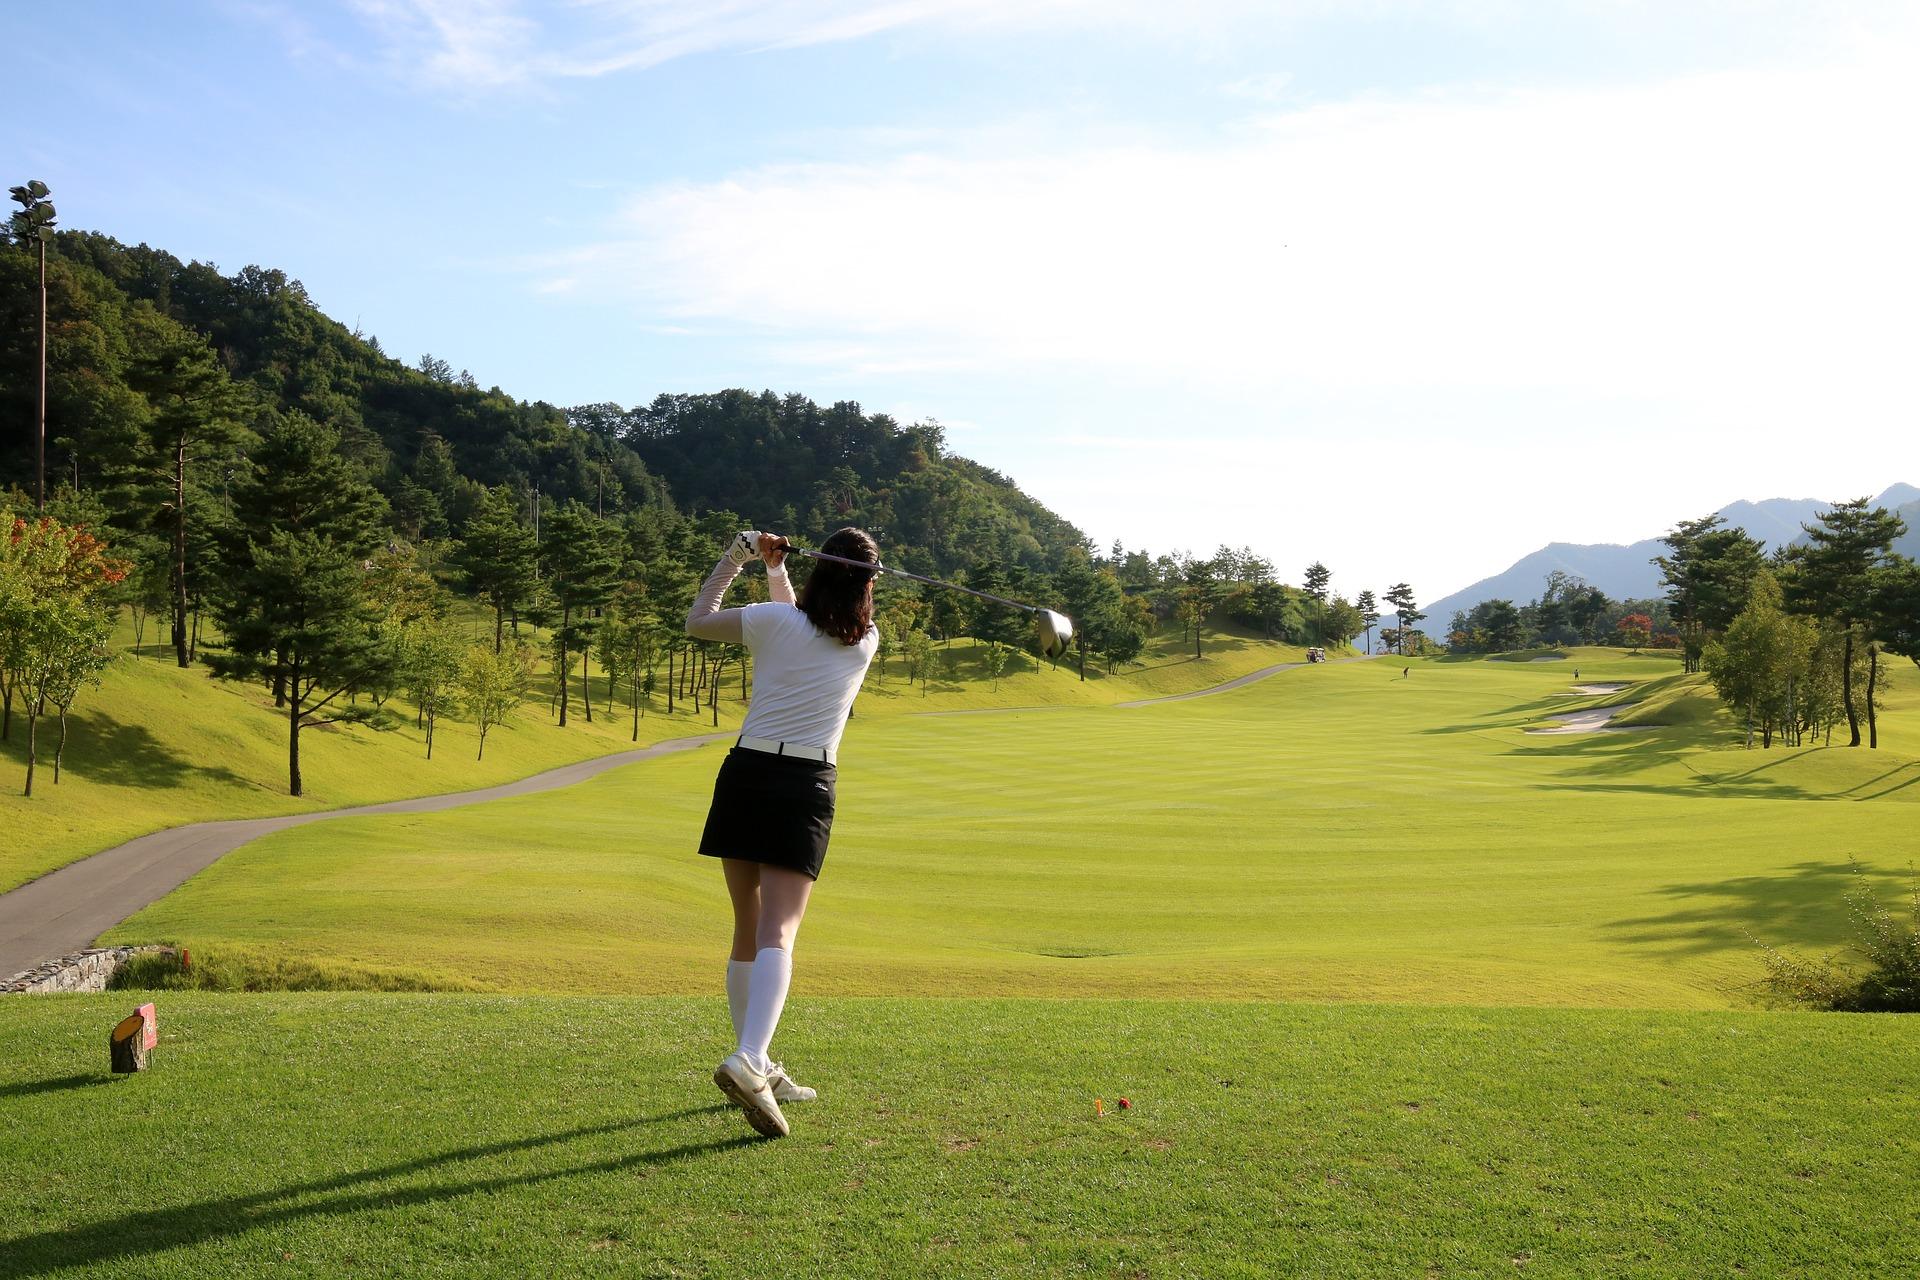 golf-3683339_1920